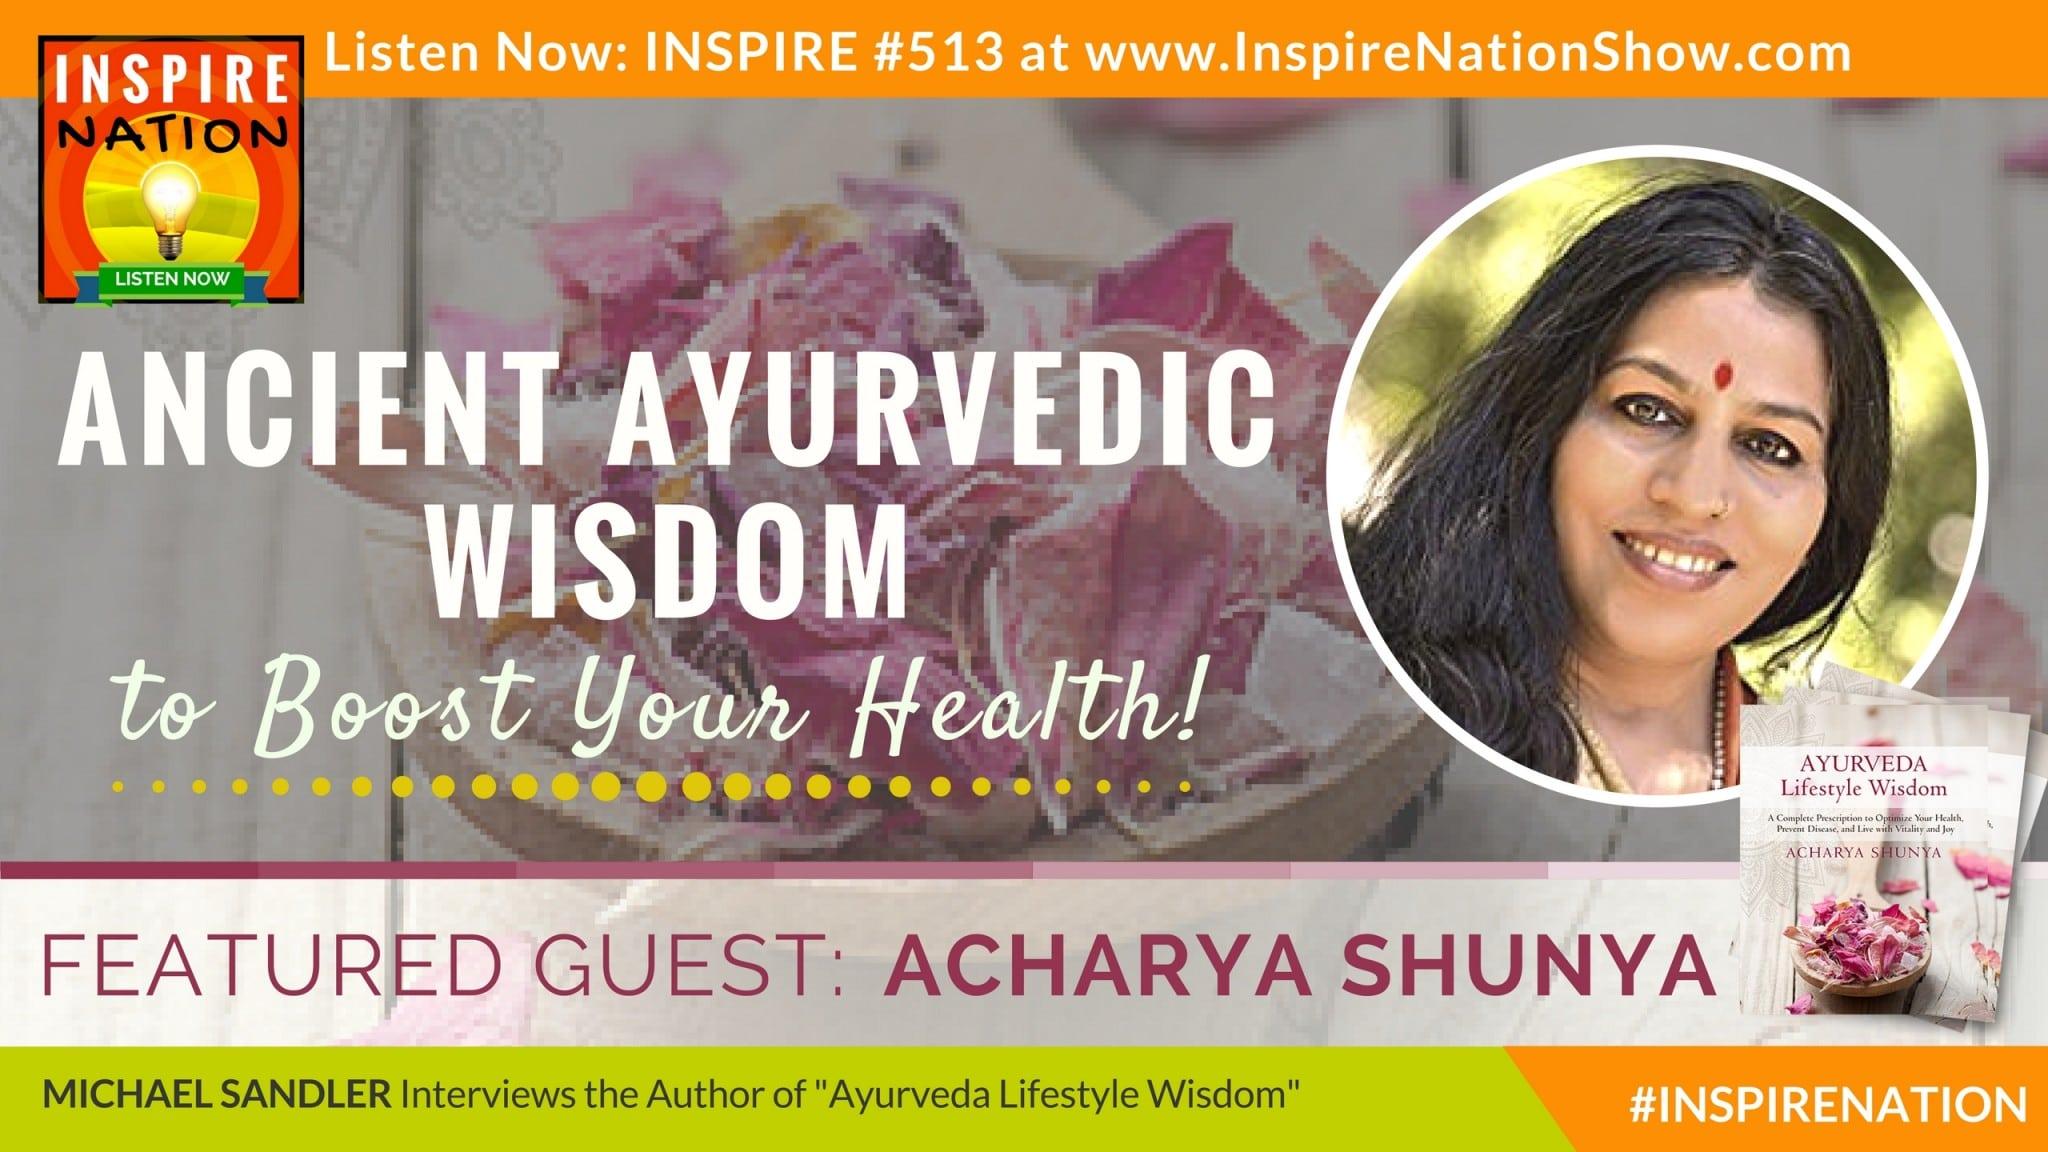 Listen to Michael Sandler's interview with Acharya Shunya on ayurvedic wisdom to boost your health!